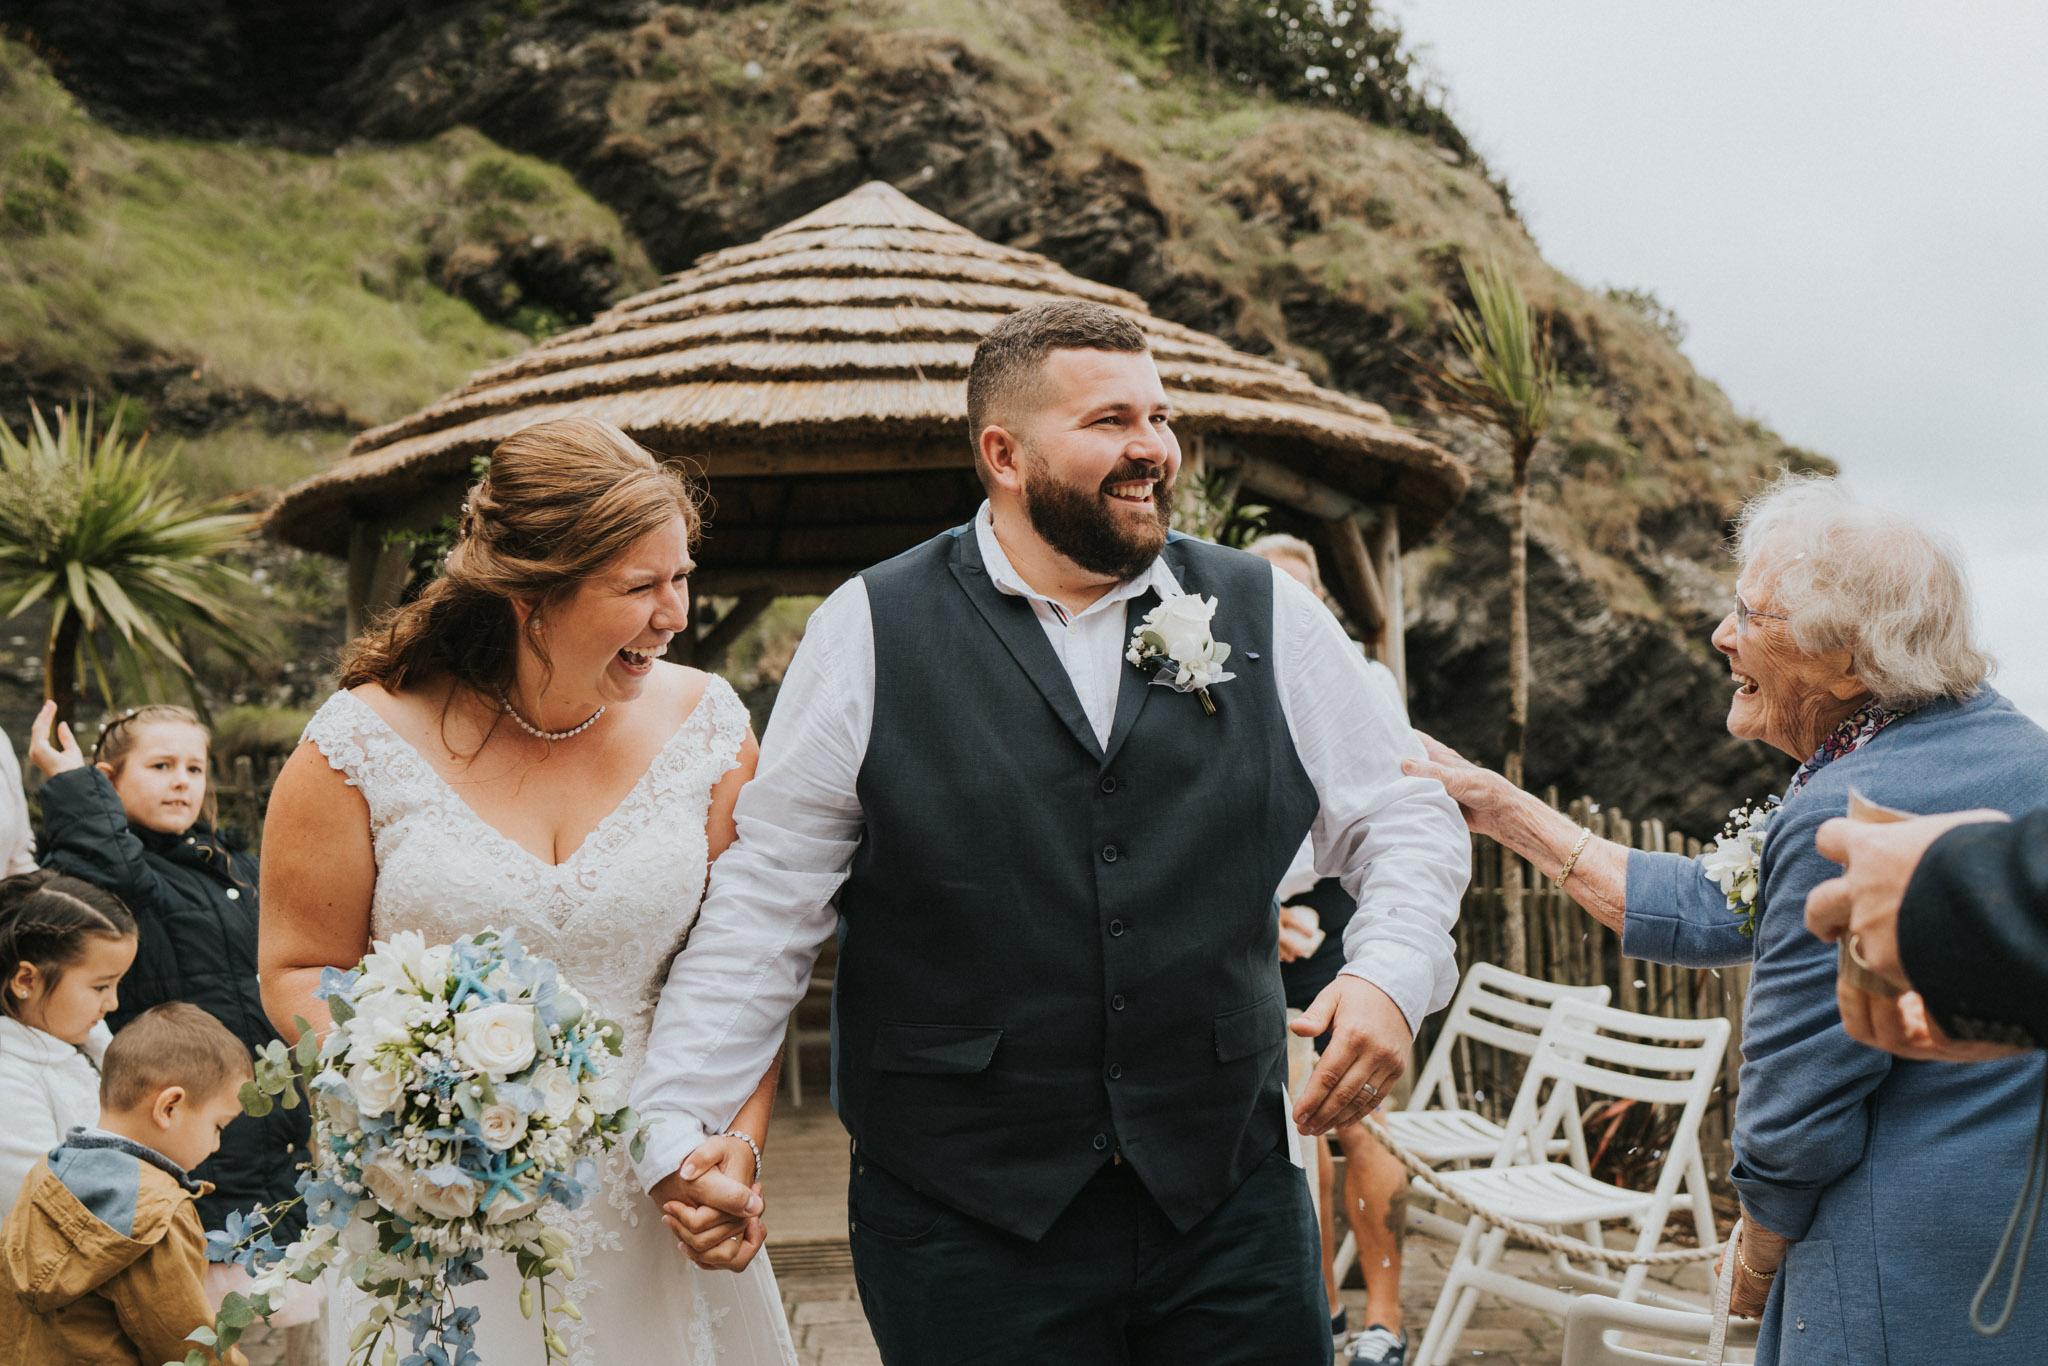 John-Amy-Tunnels-Beaches-Ilfracombe-Devon-Outdoor-Wedding-UK-Colchester-Essex-Alternative-Wedding-Photographer-Grace-Elizabeth (20 of 31).jpg